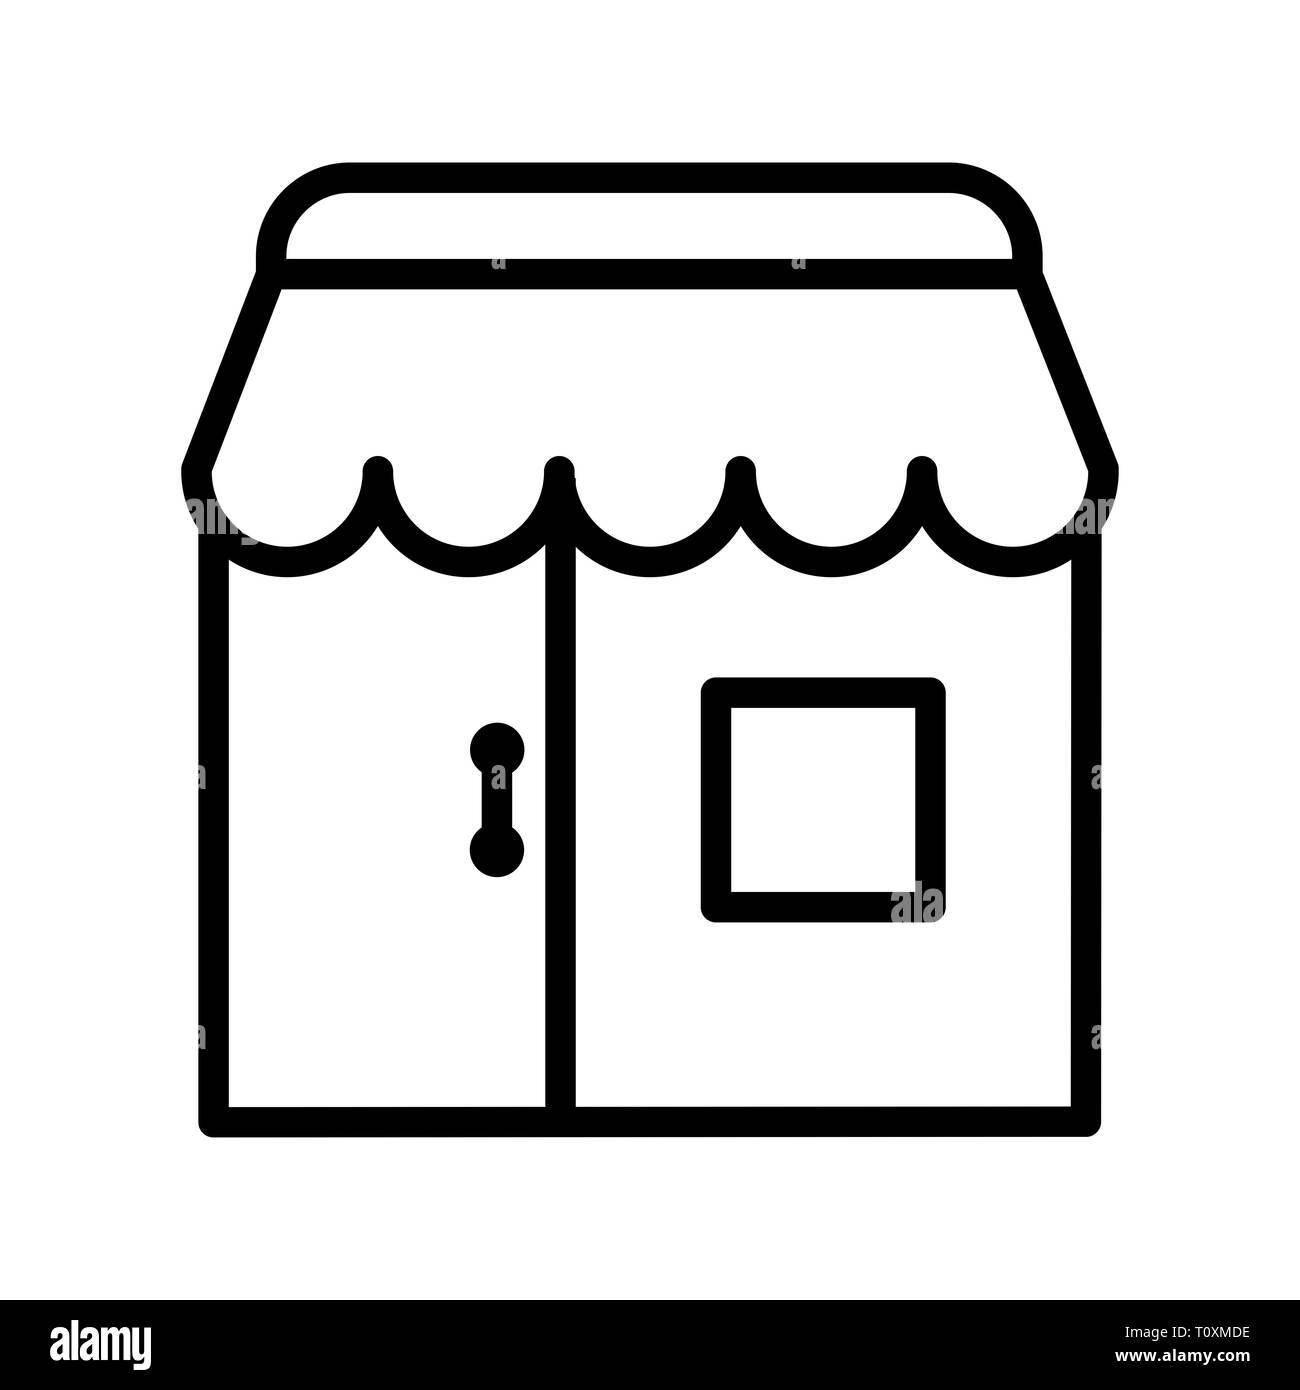 Illustration Shop Icon Stock Photo